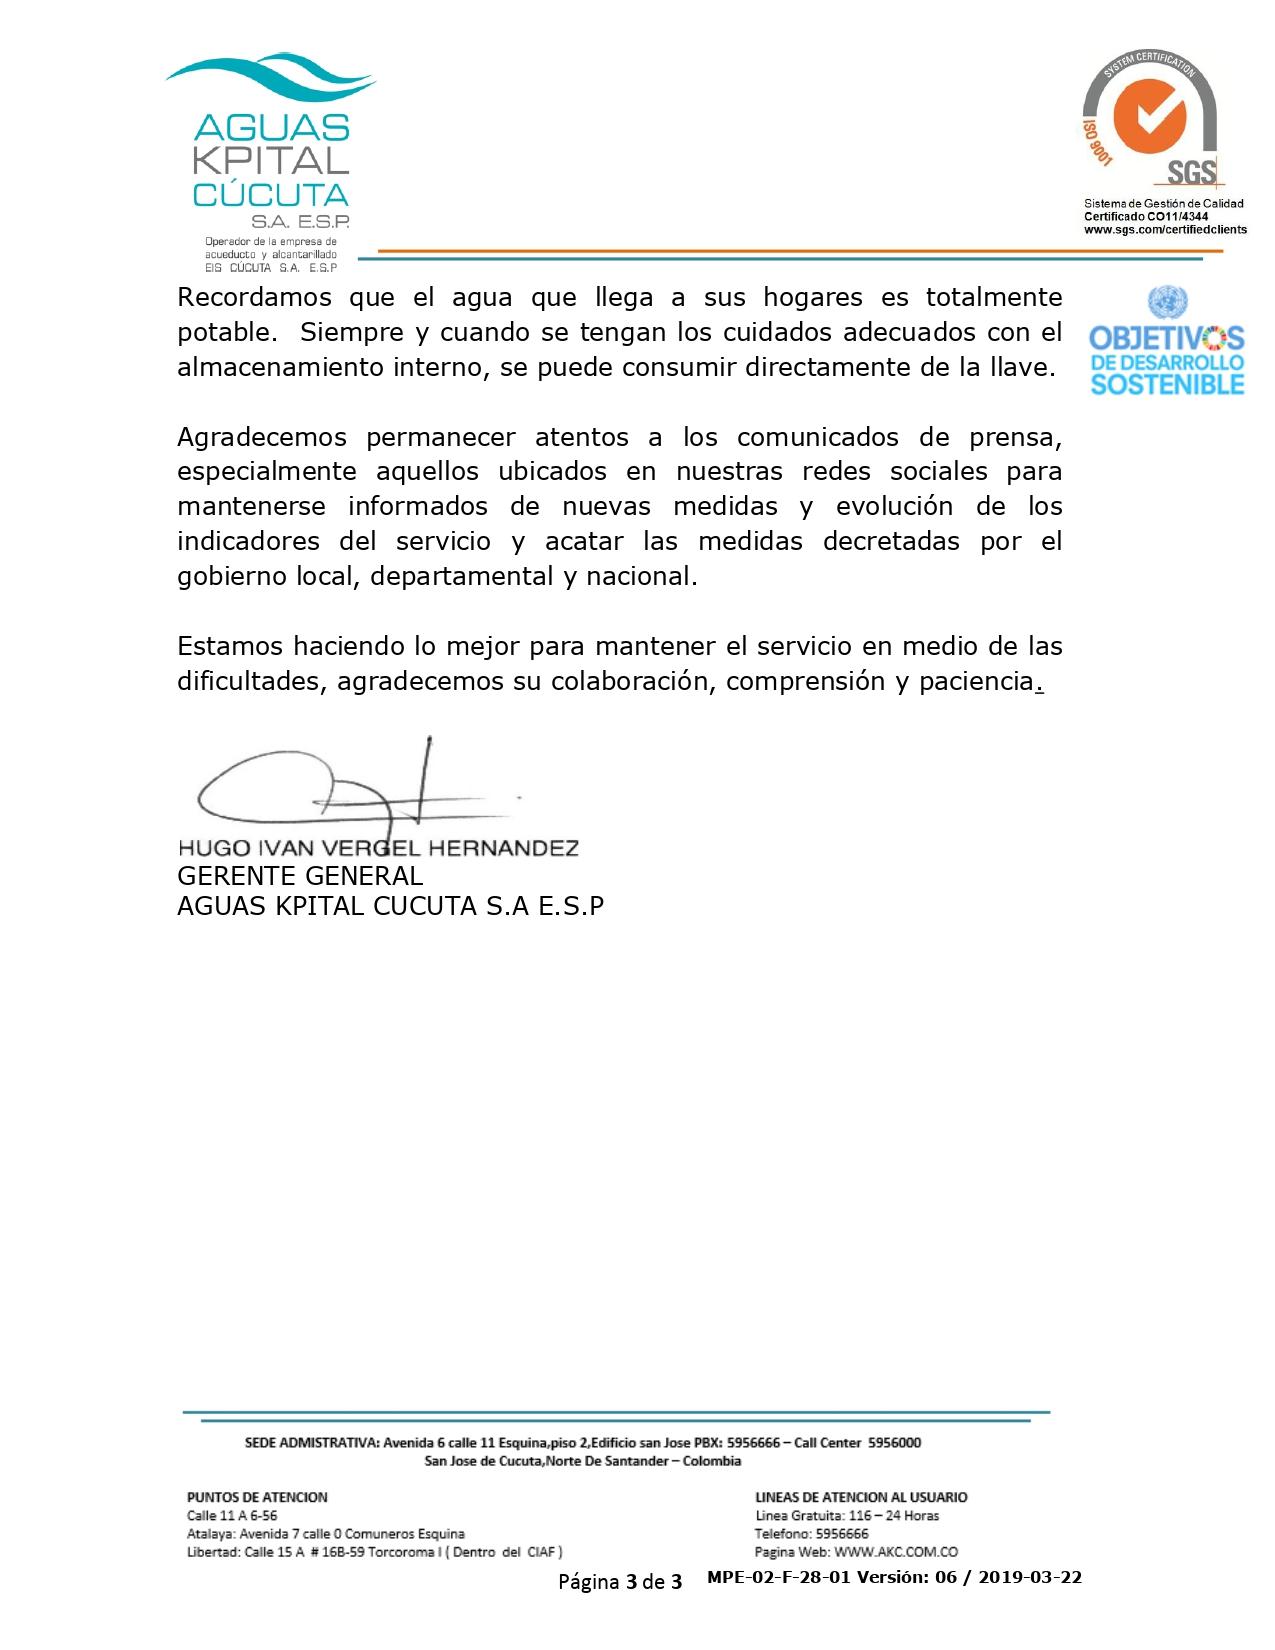 Directriz Externa -Medidas para pandemi.pdf_page-0003